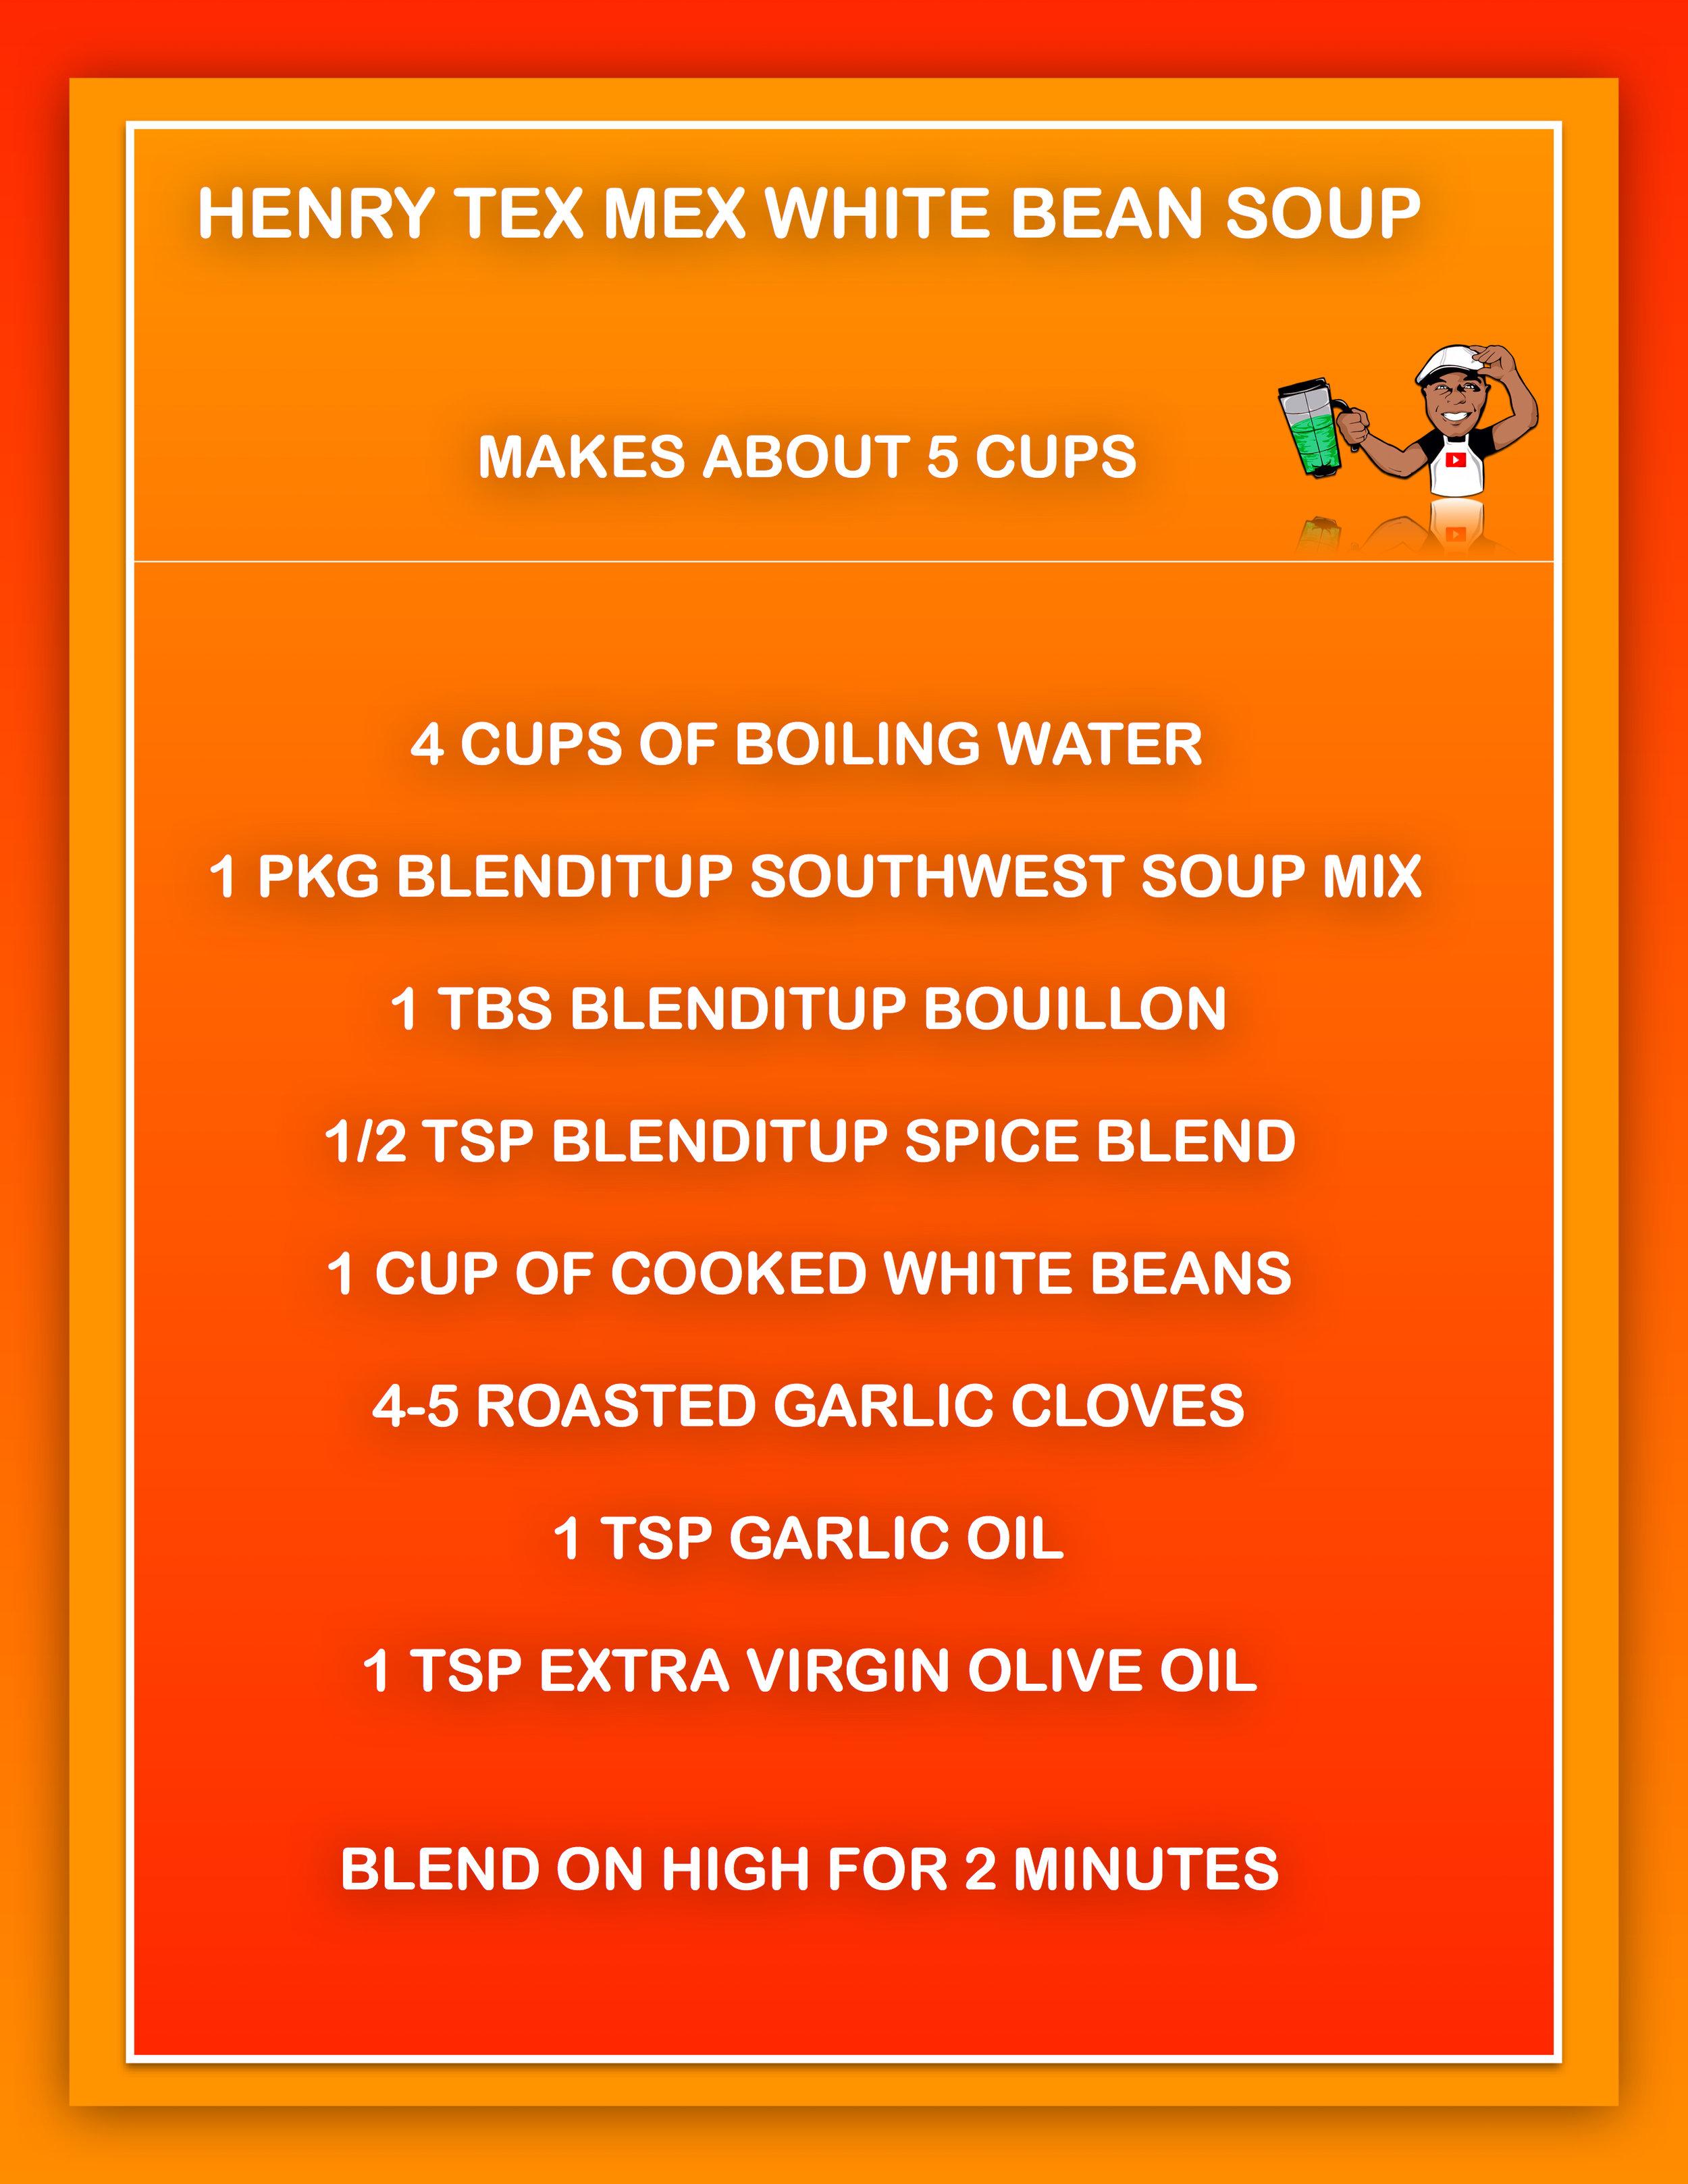 Henry Tex Mex White Bean Soup recipe.jpg